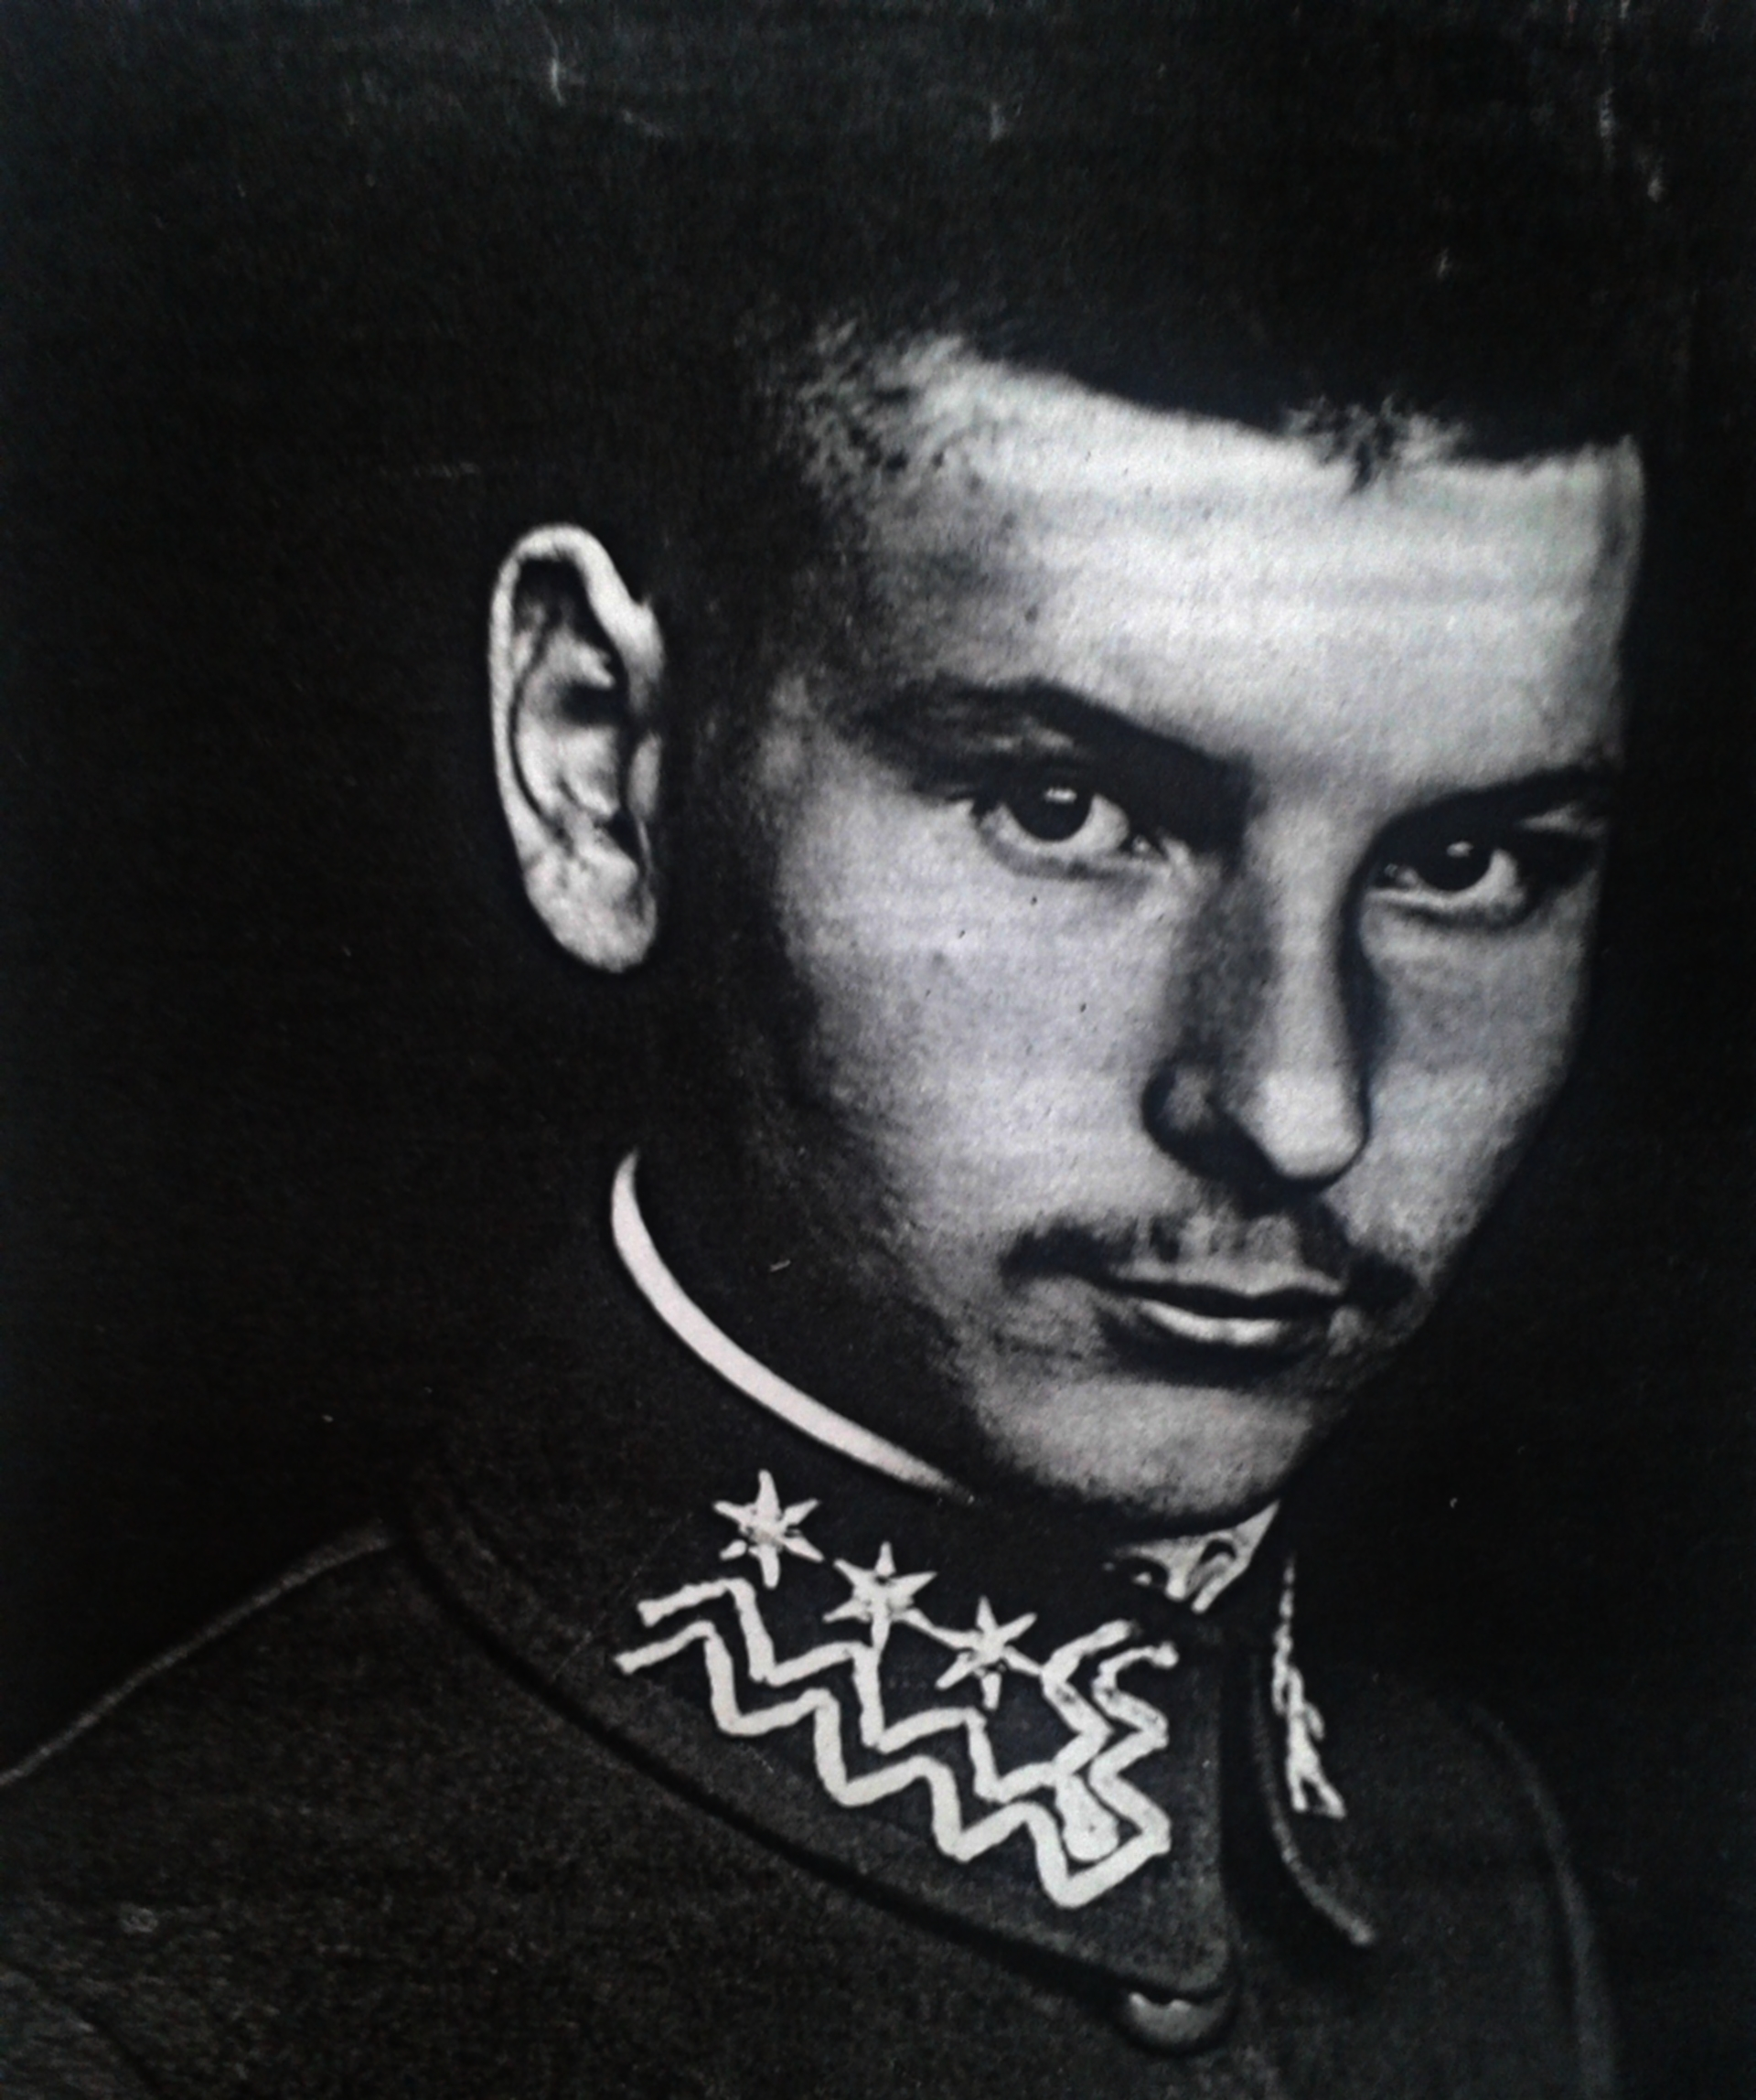 Image of Adam Duleba from Wikidata